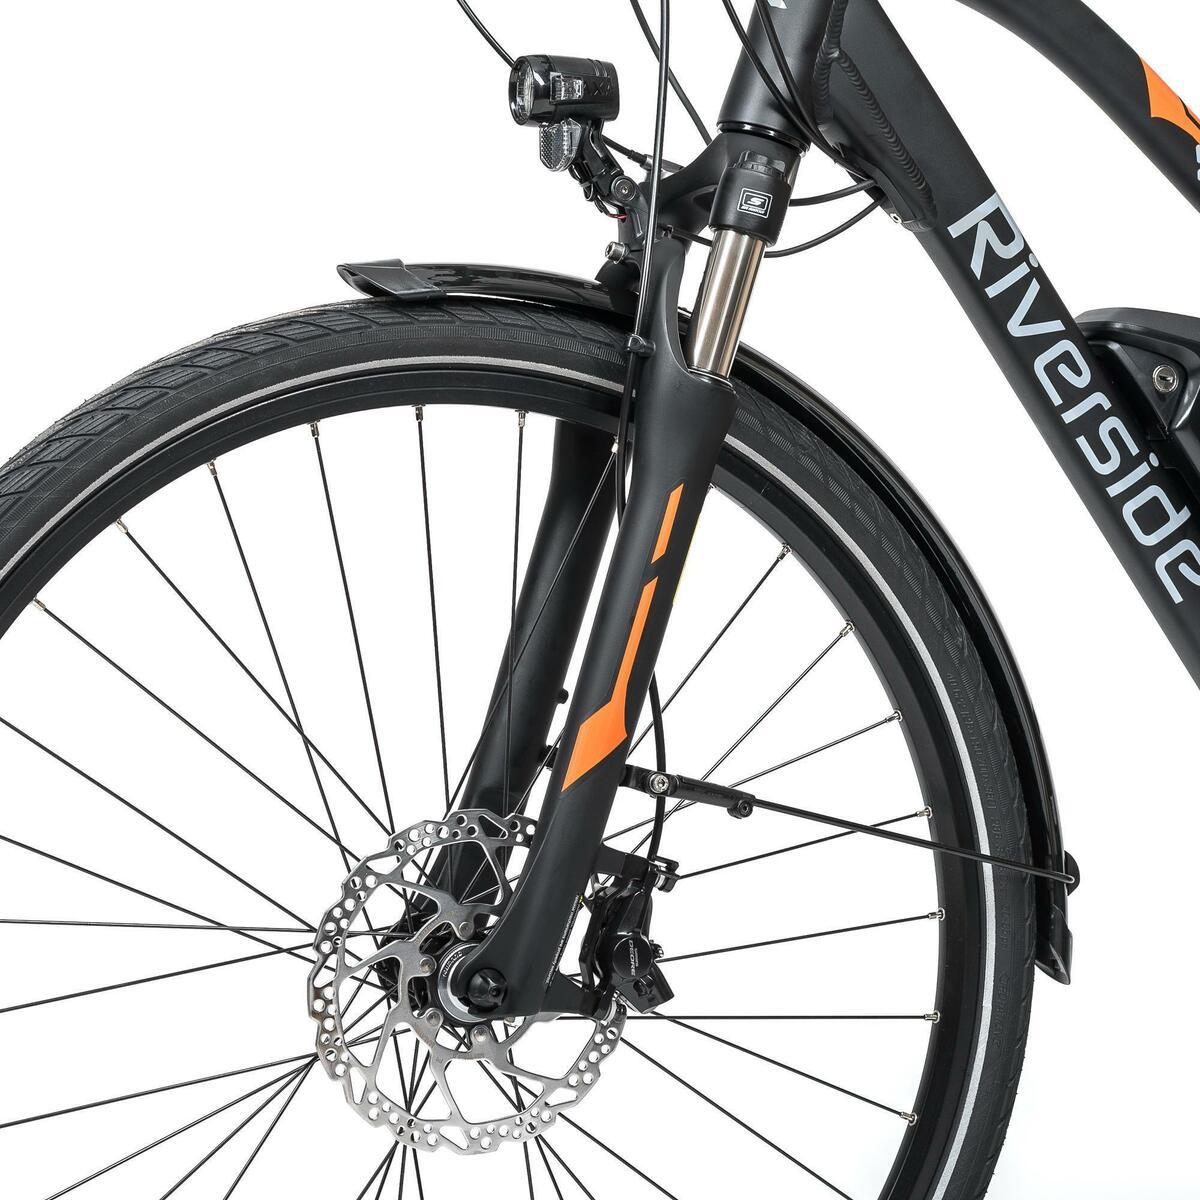 Bild 5 von E-Bike 28 Trekkingrad Riverside 700 Damen Performance CX 500Wh anthrazit/orange